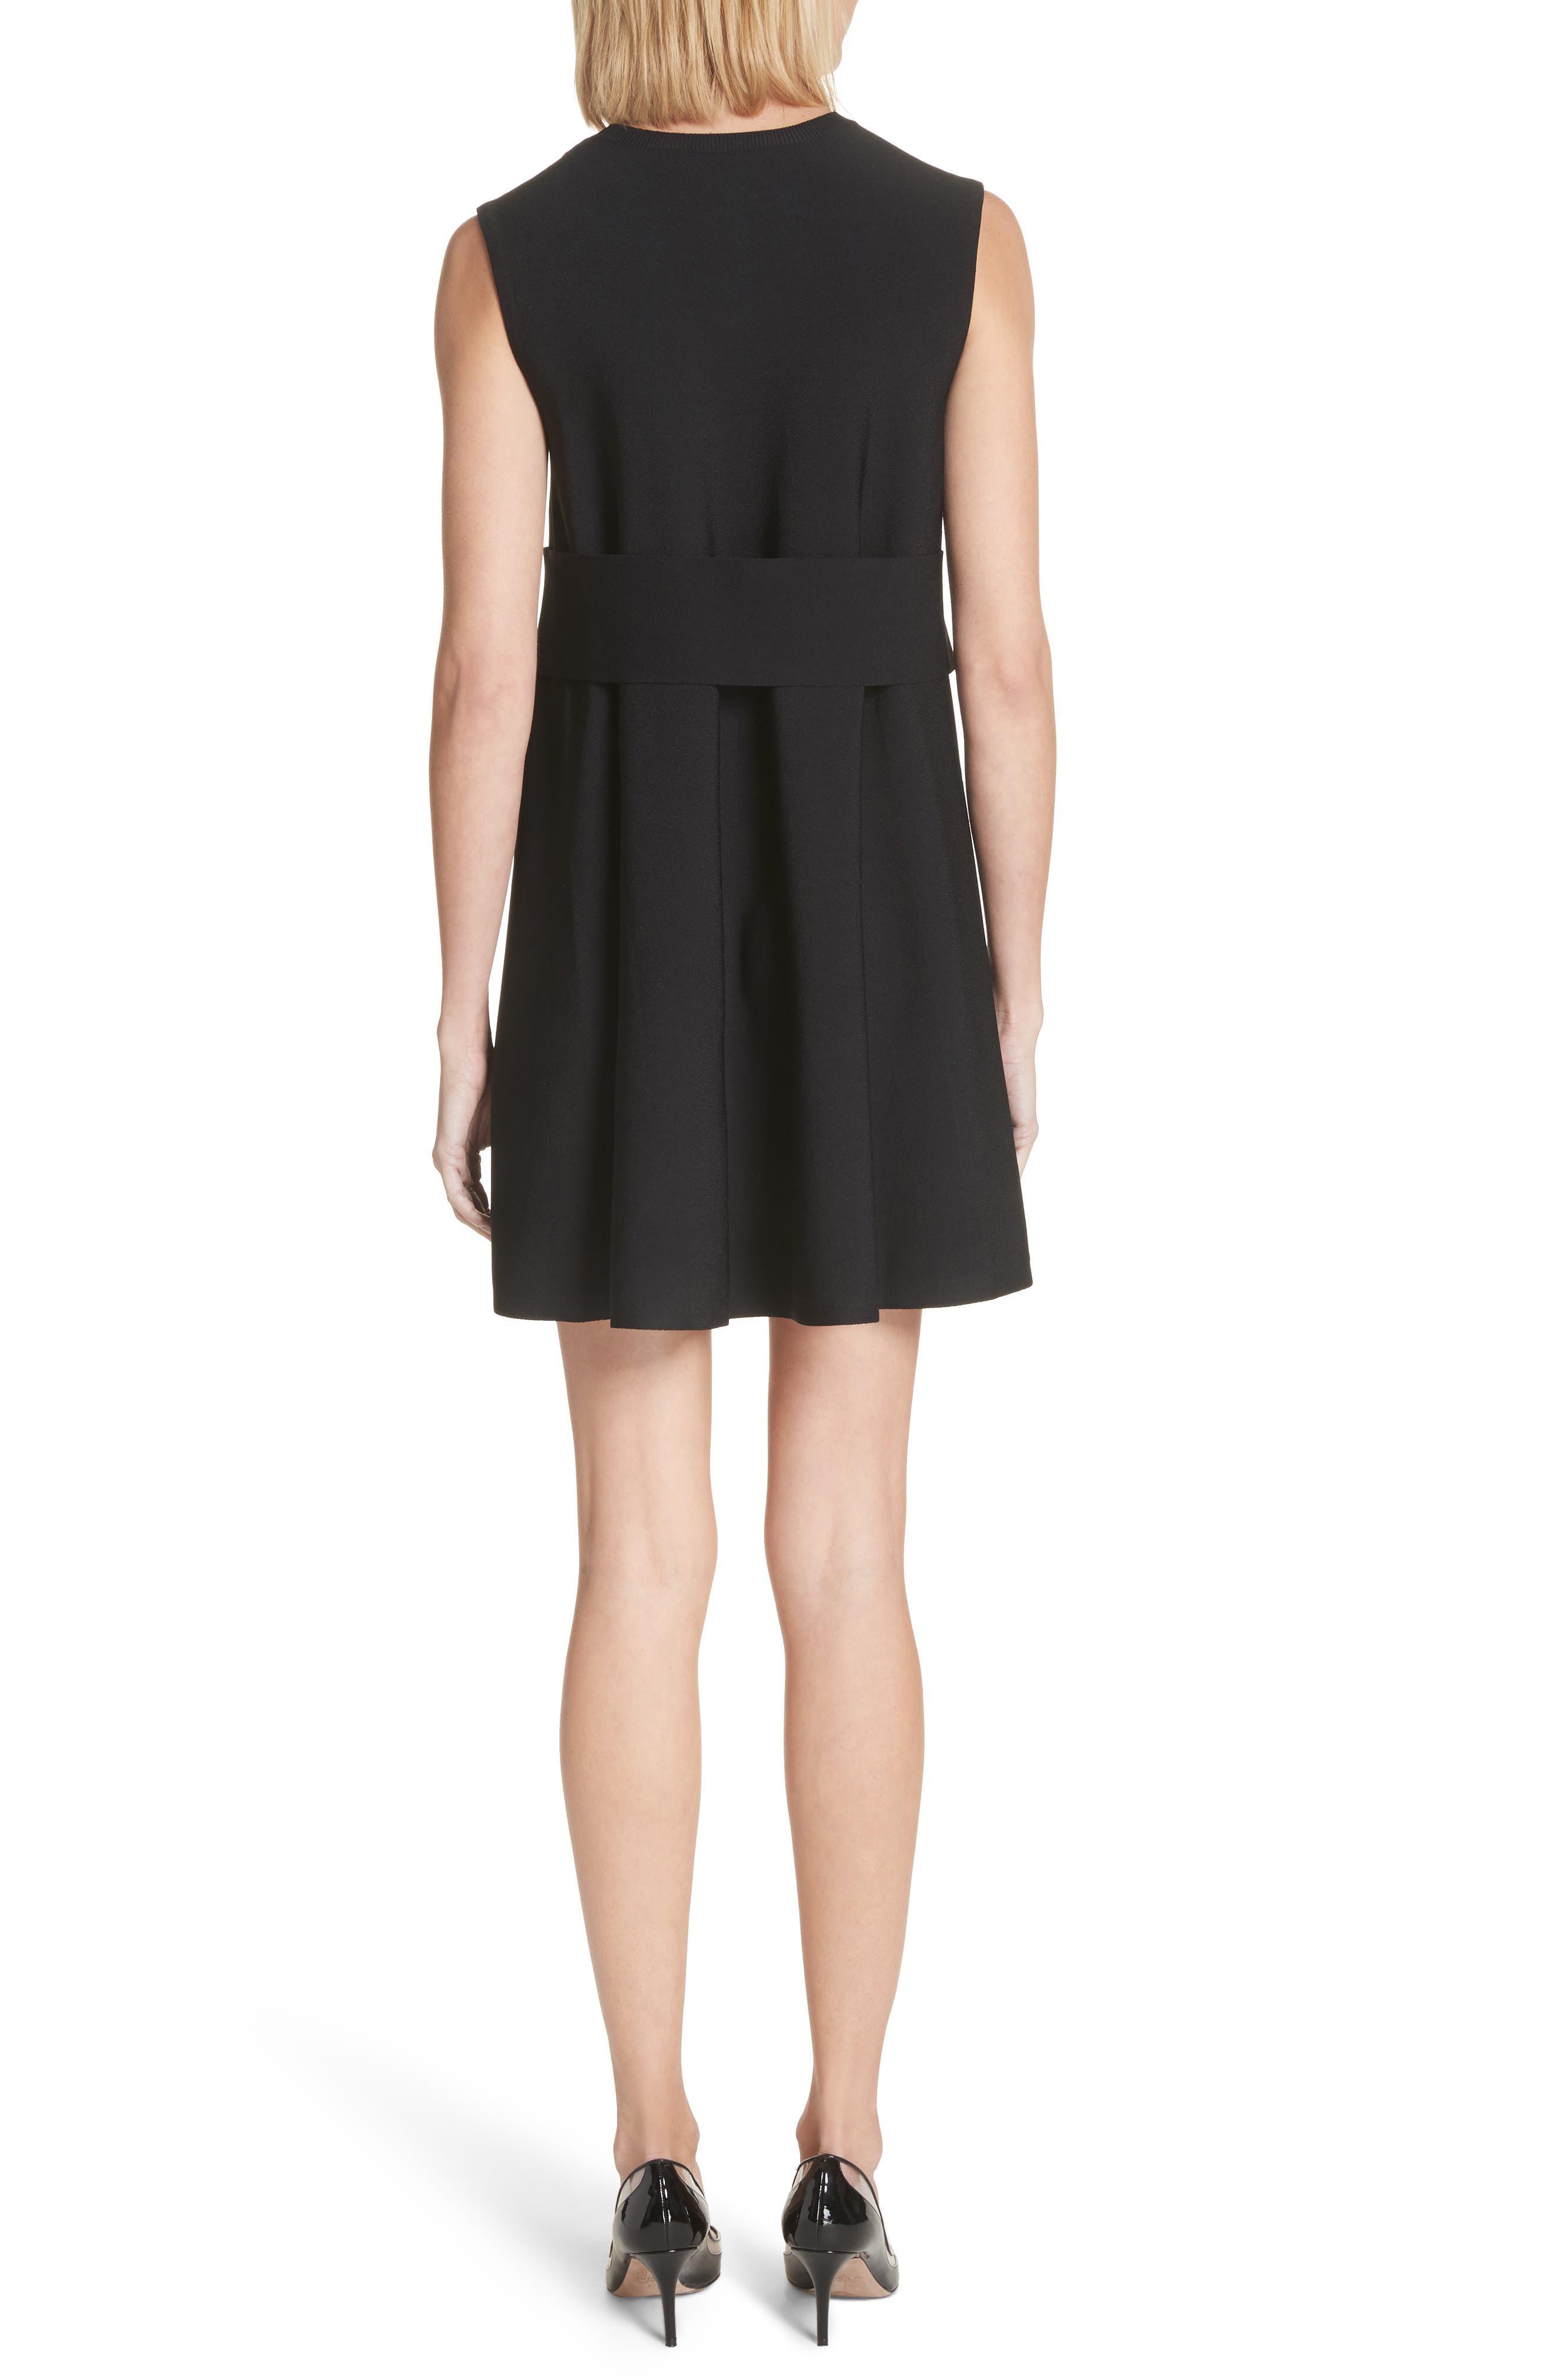 Lace Side Contrast Shift Dress,                             Alternate thumbnail 2, color,                             Ivory/ Black